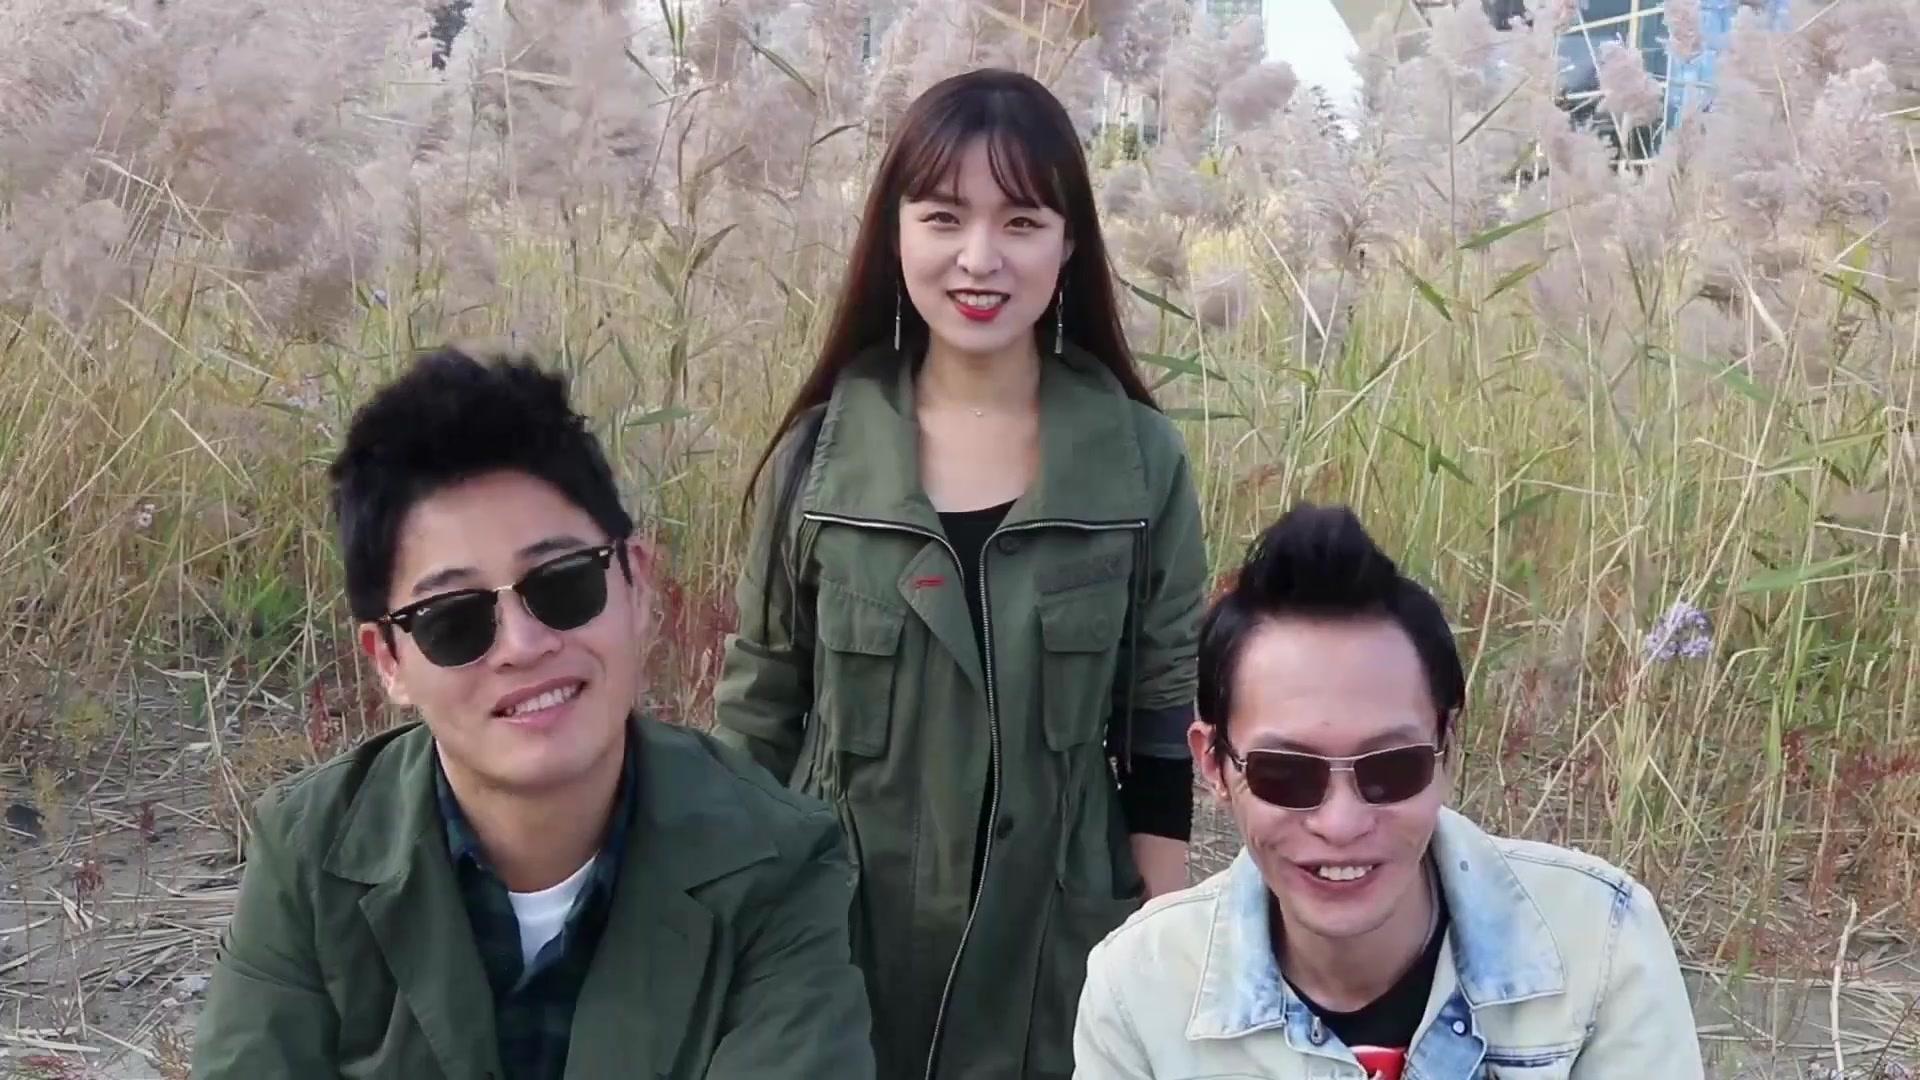 Todo Sobre Corea del Sur Episode 117: Reading Mean Comments #2